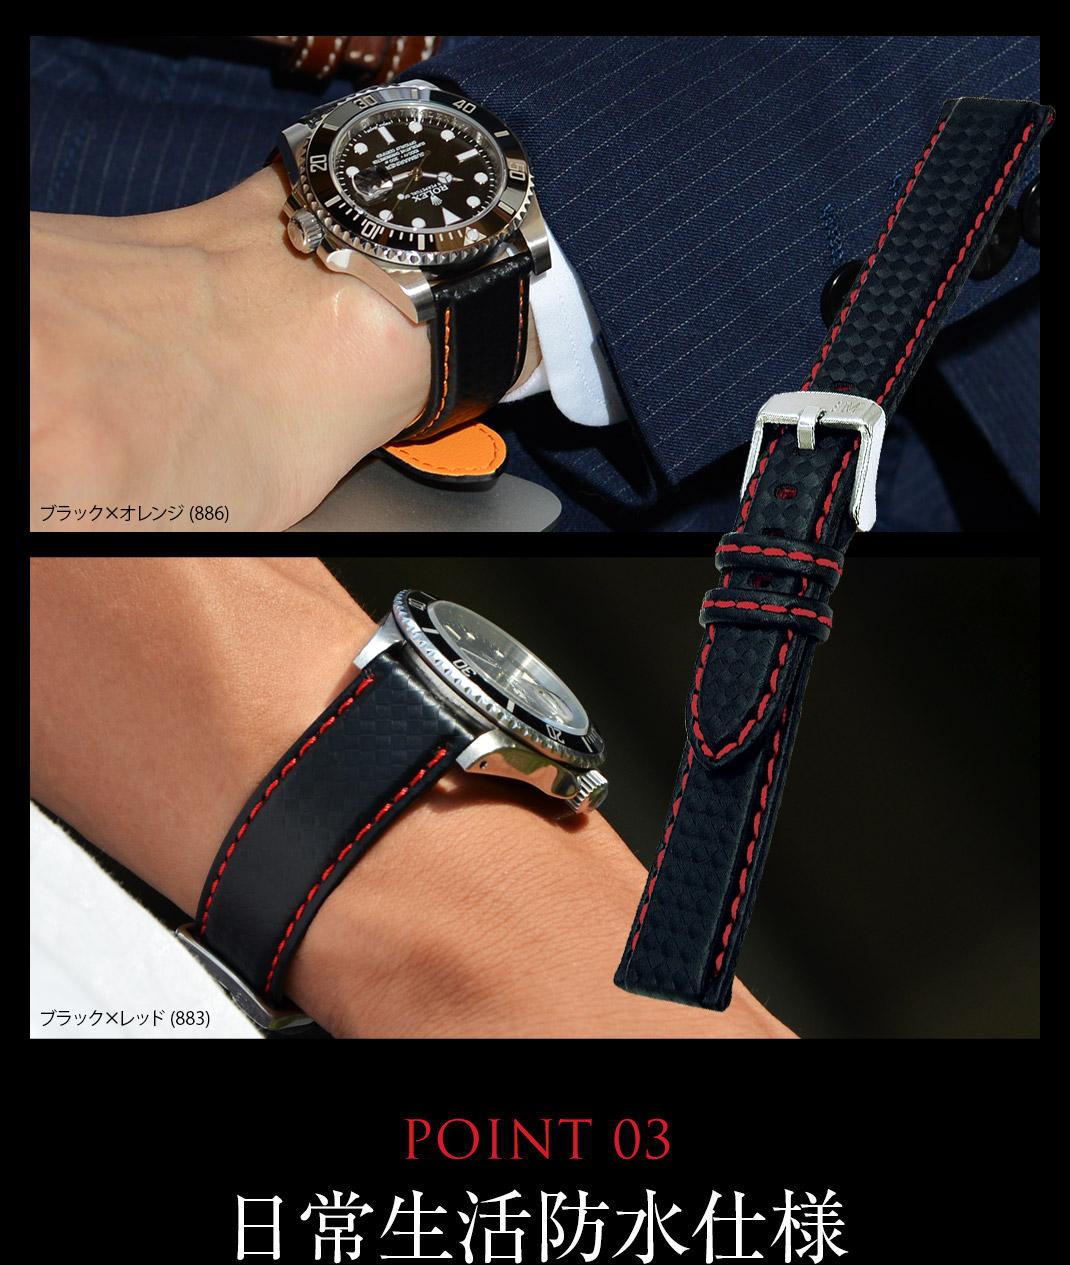 point 02 ラバーに見えない高級感 point 03 日常生活防水仕様